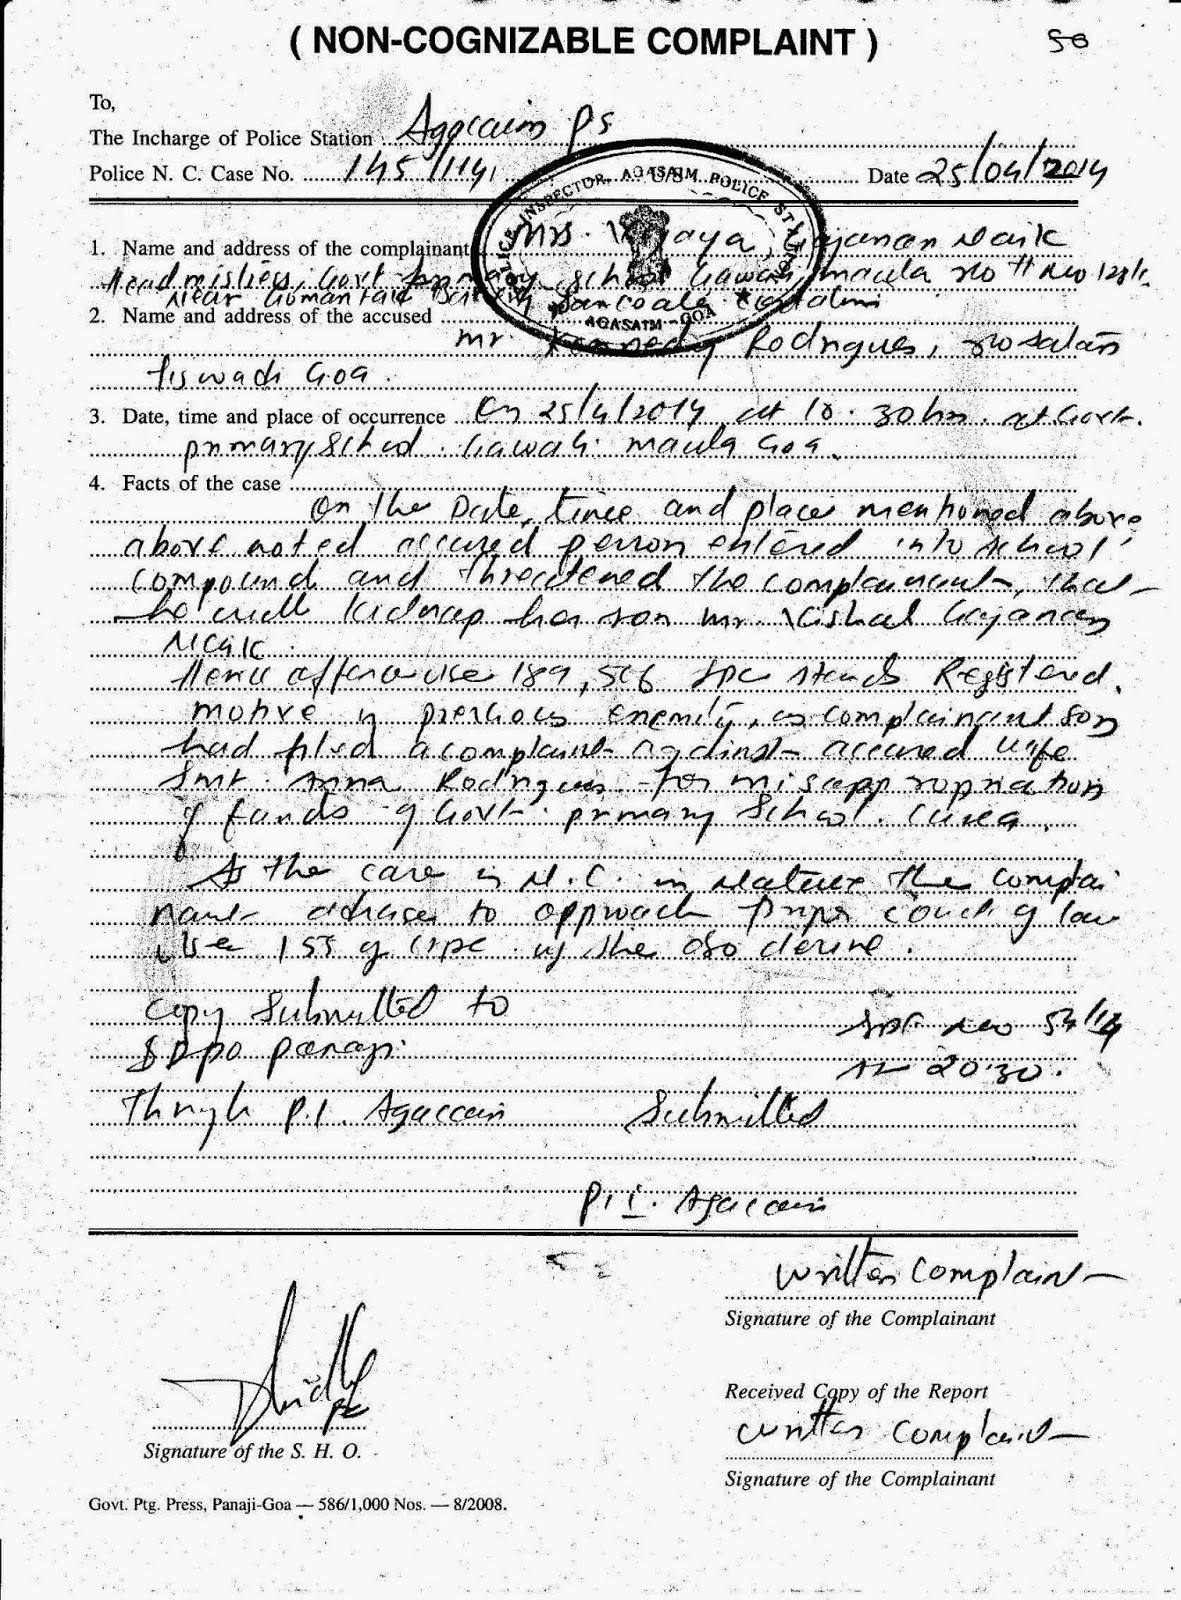 Kuch toh Gadbad Hai!!!: complaint filed against husband of